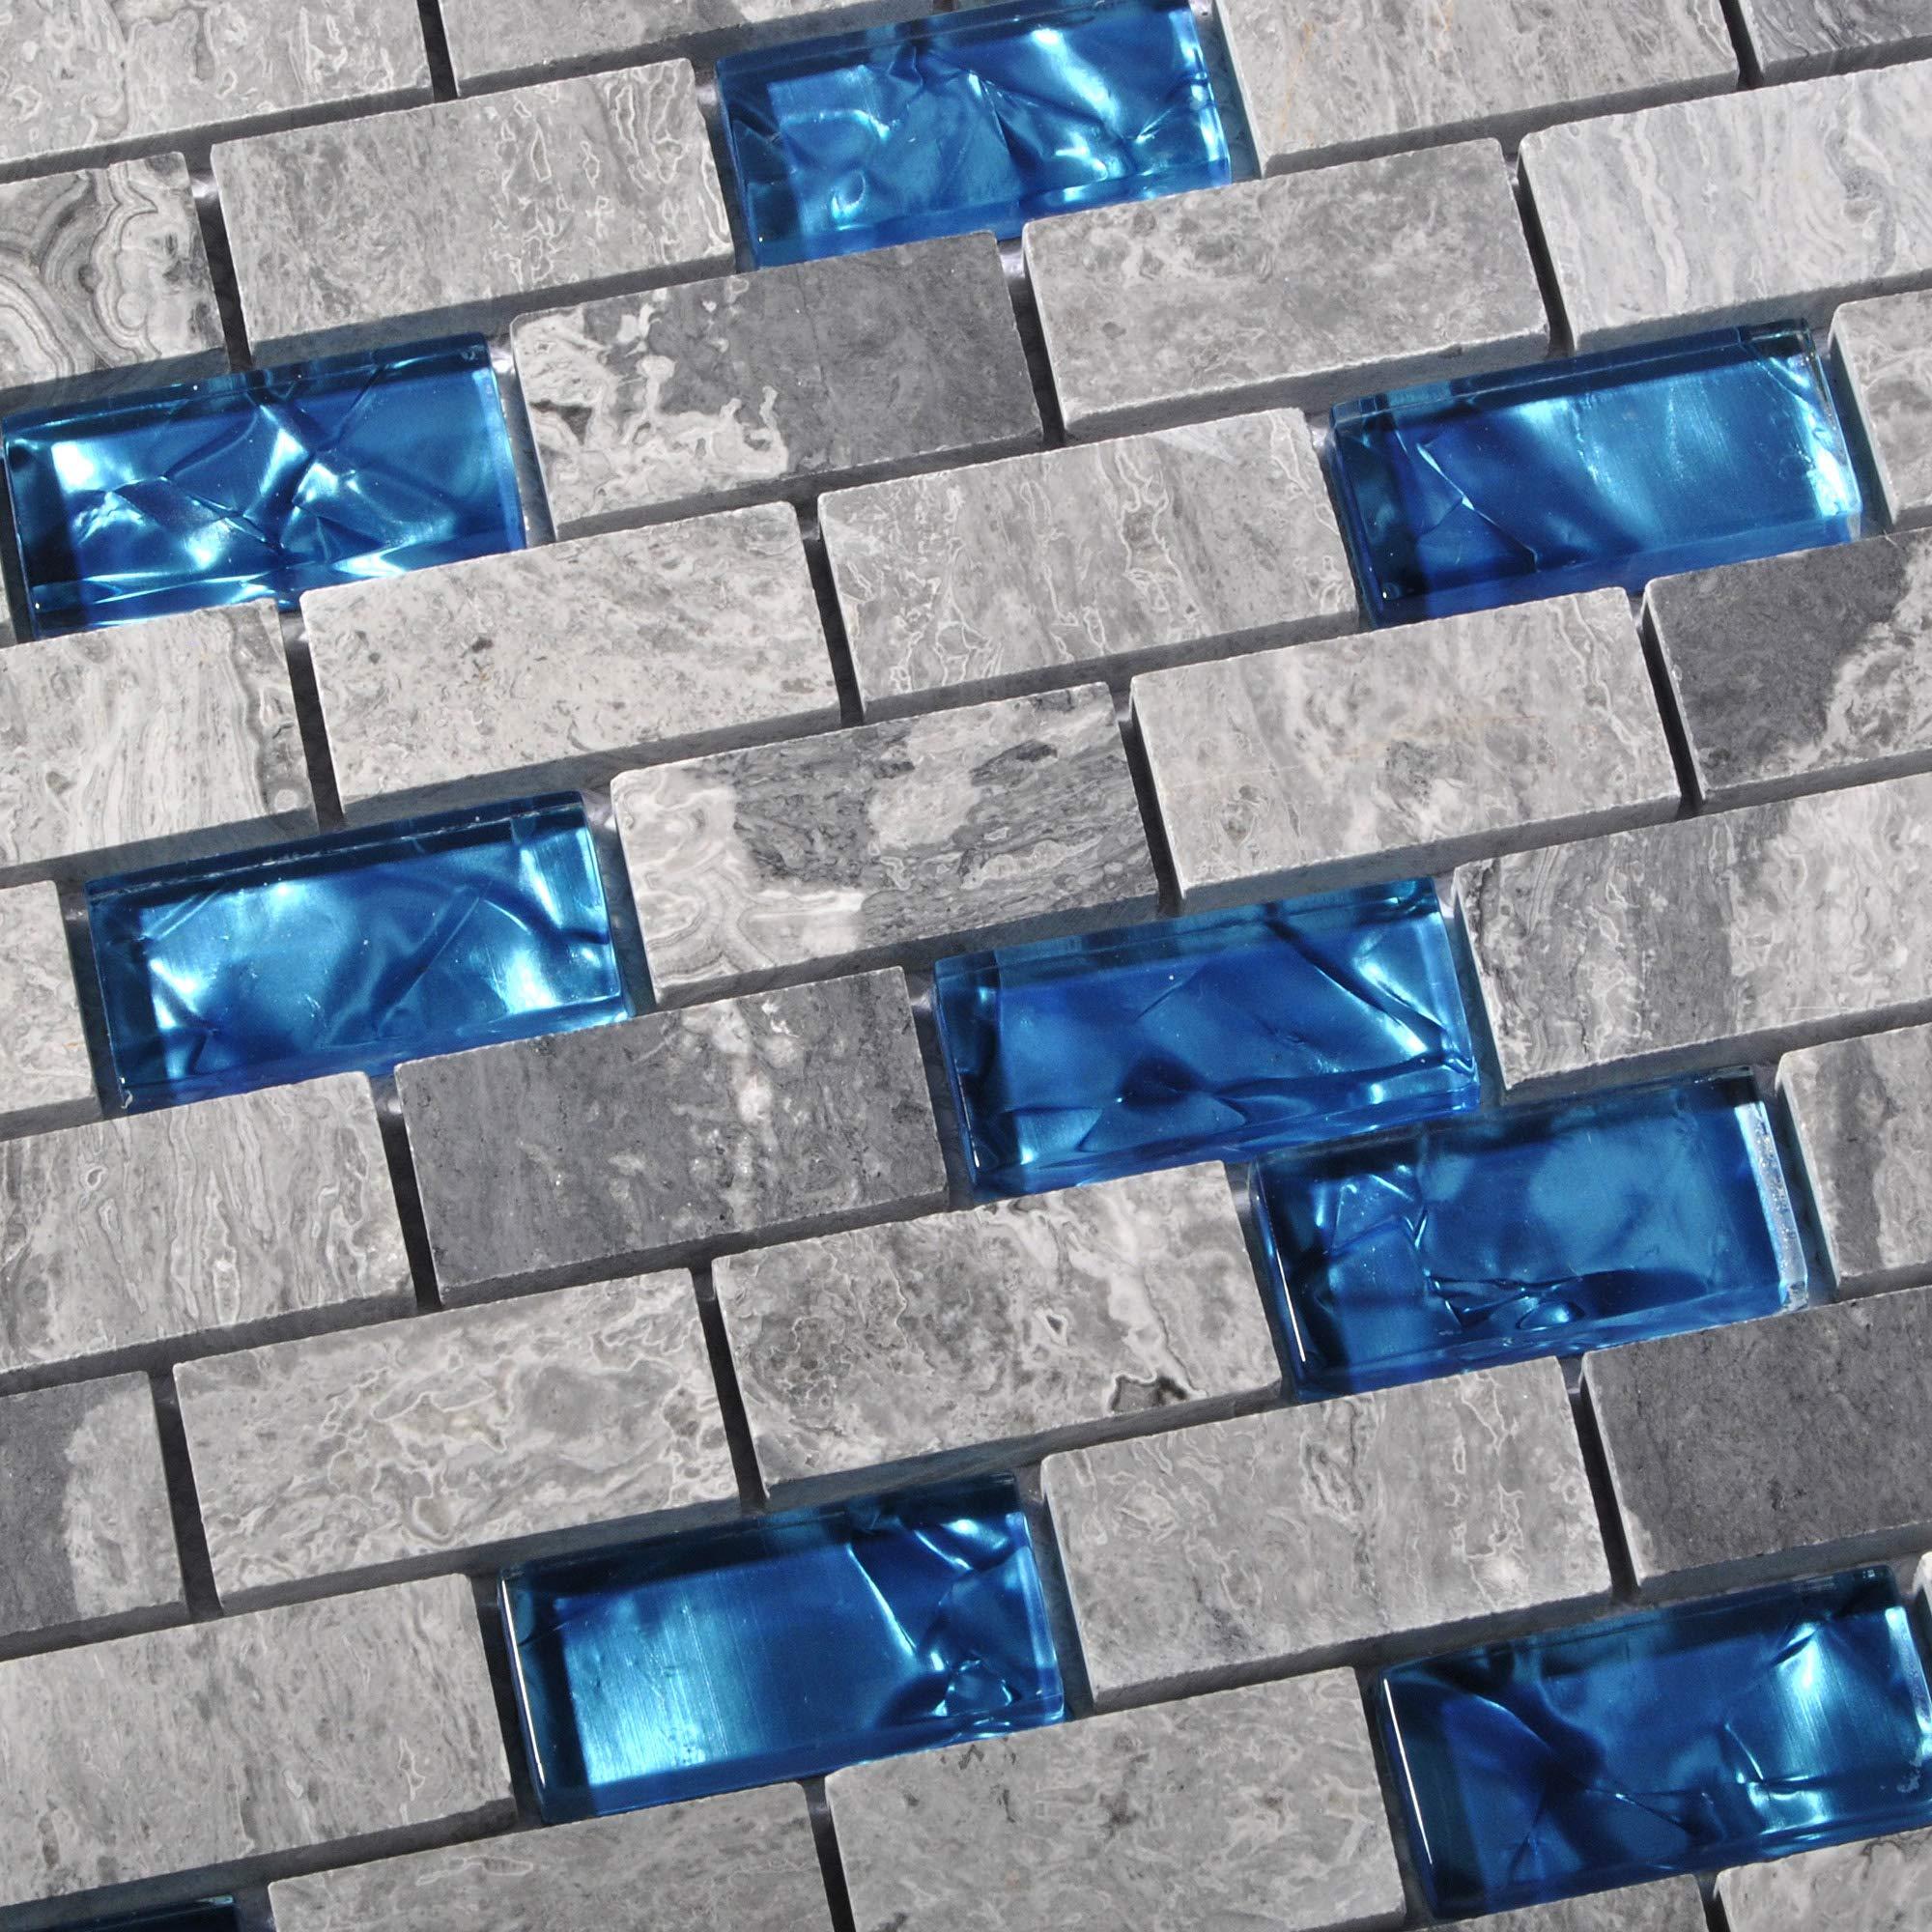 Ocean Teal Blue Glass Nature Stone Tile Kitchen Backsplash 3D Bath Shower Accent Wall Decor Gray Wave Marble 1 x 2 Subway Art Mosaics TSTNB03 (1 Sample 11.8 X 11.8 Inches)